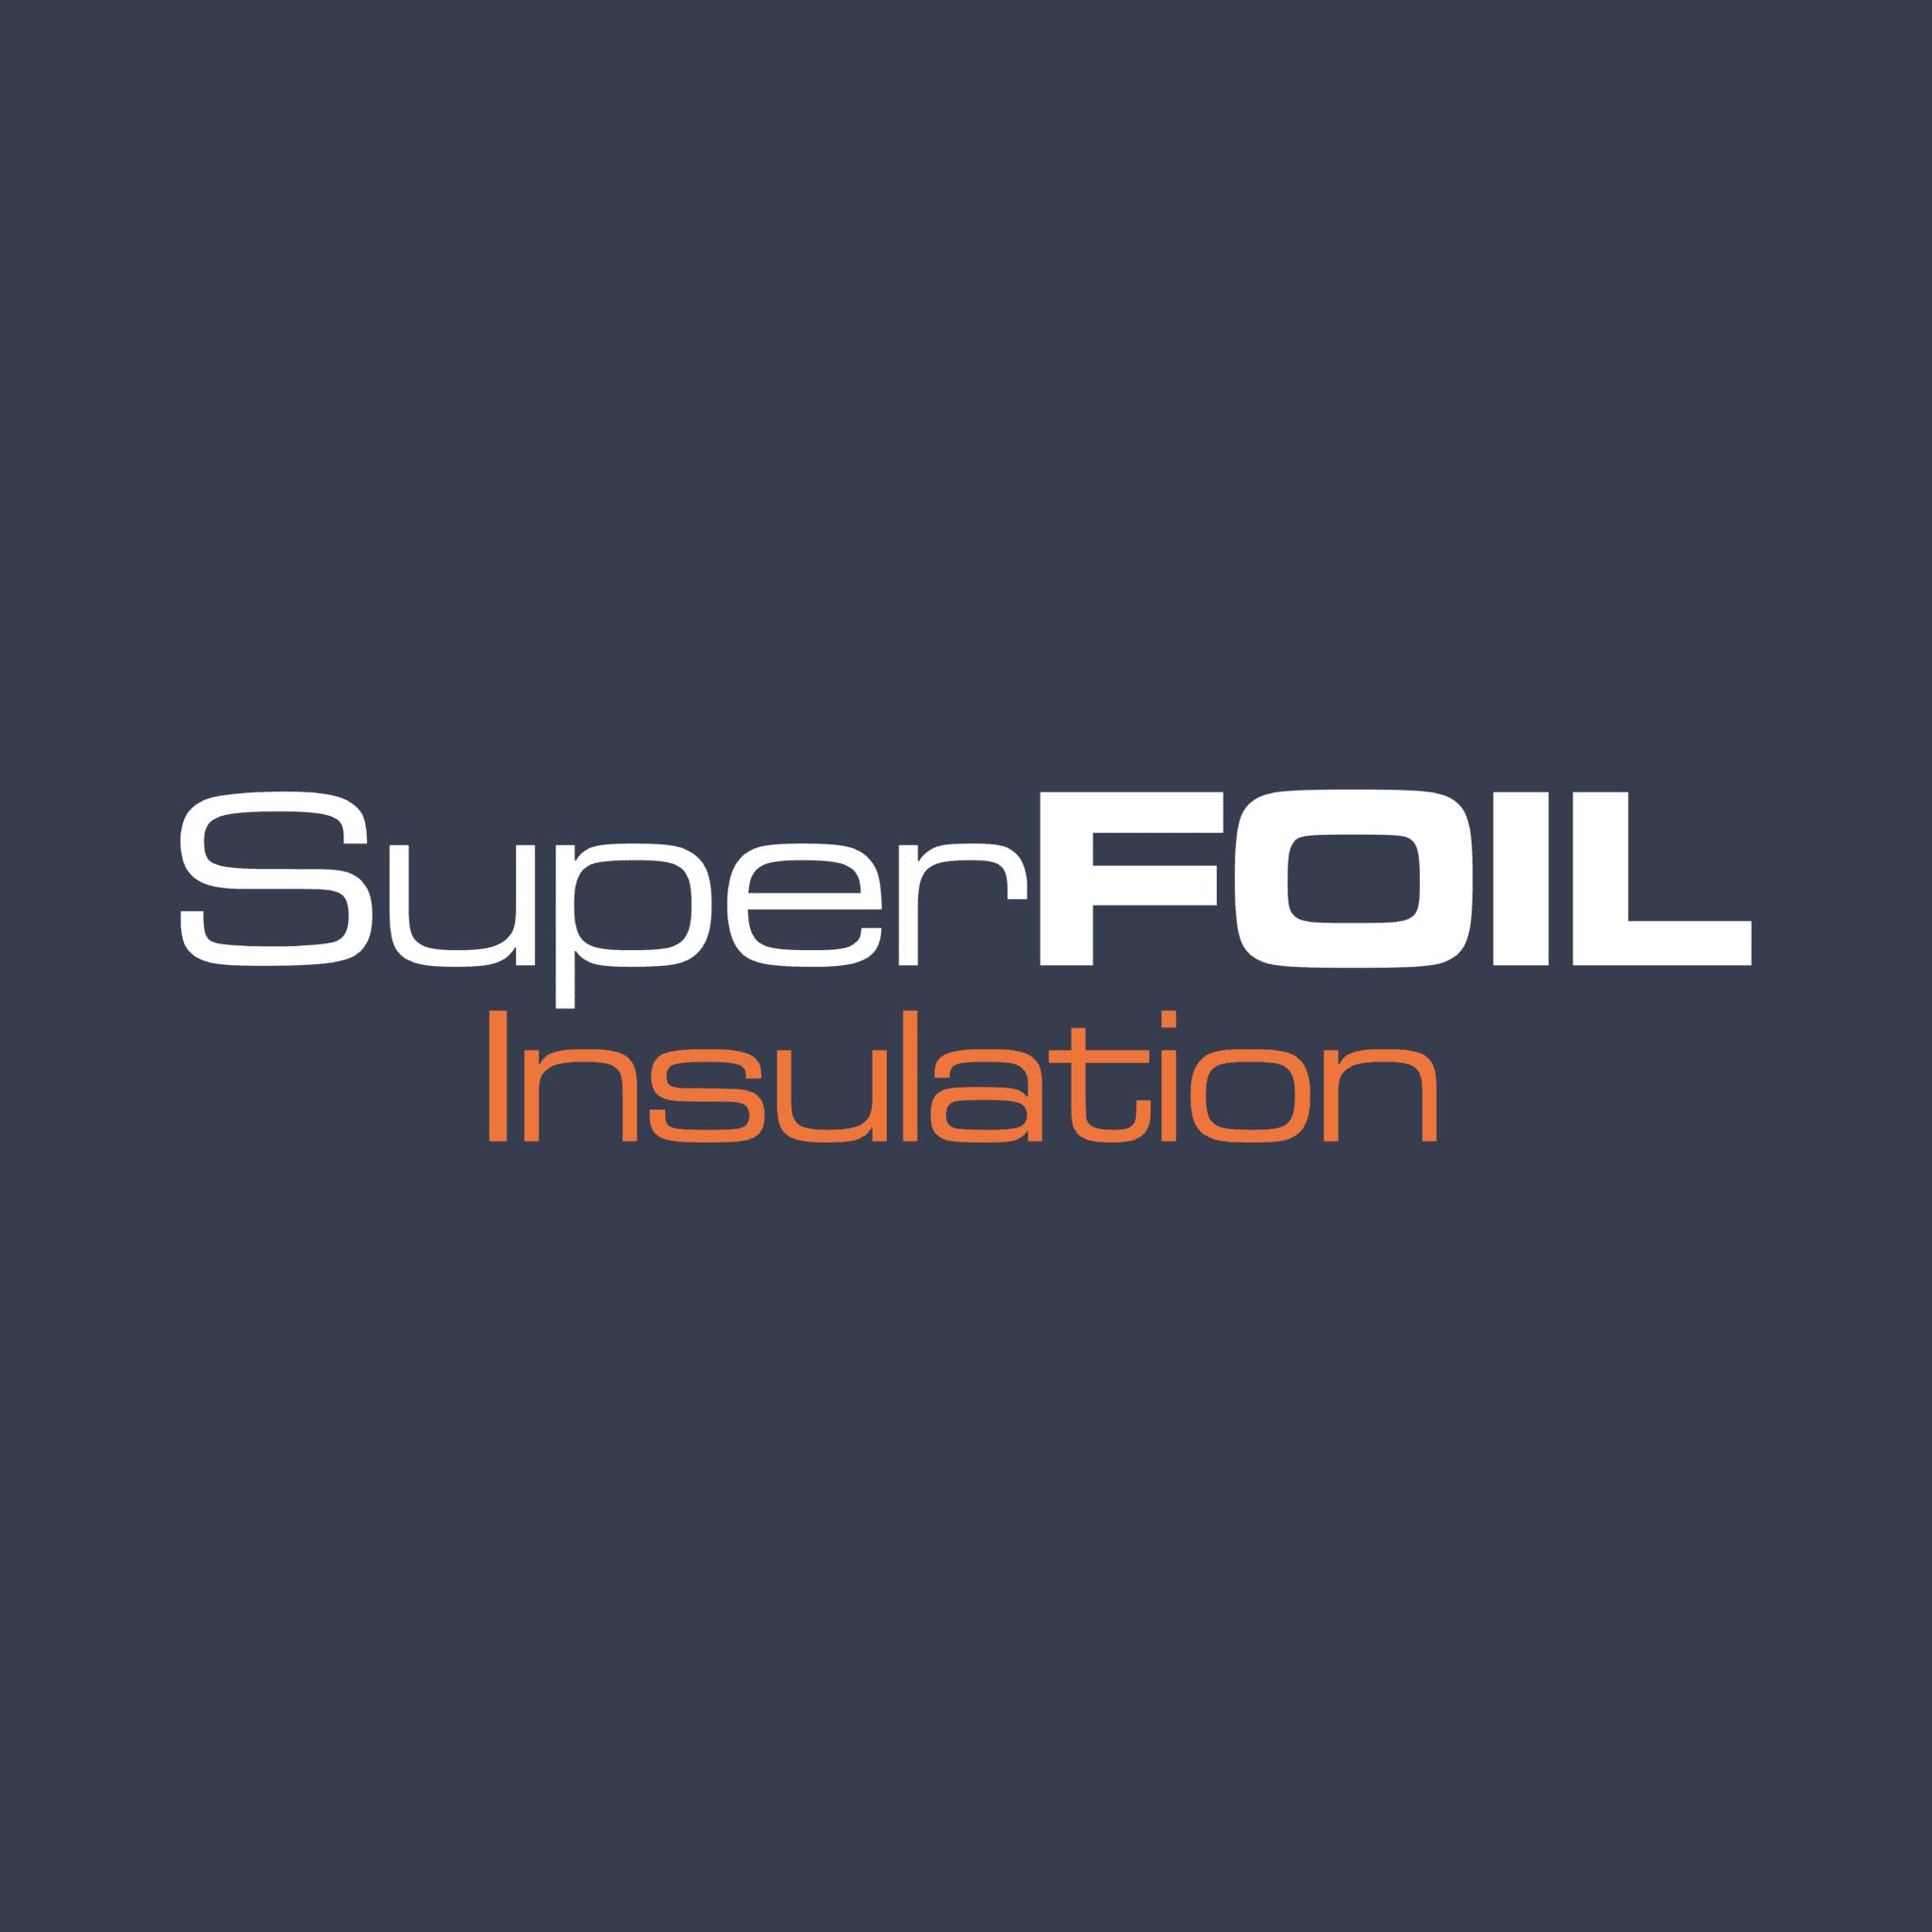 SuperFOIL Insulation Logo